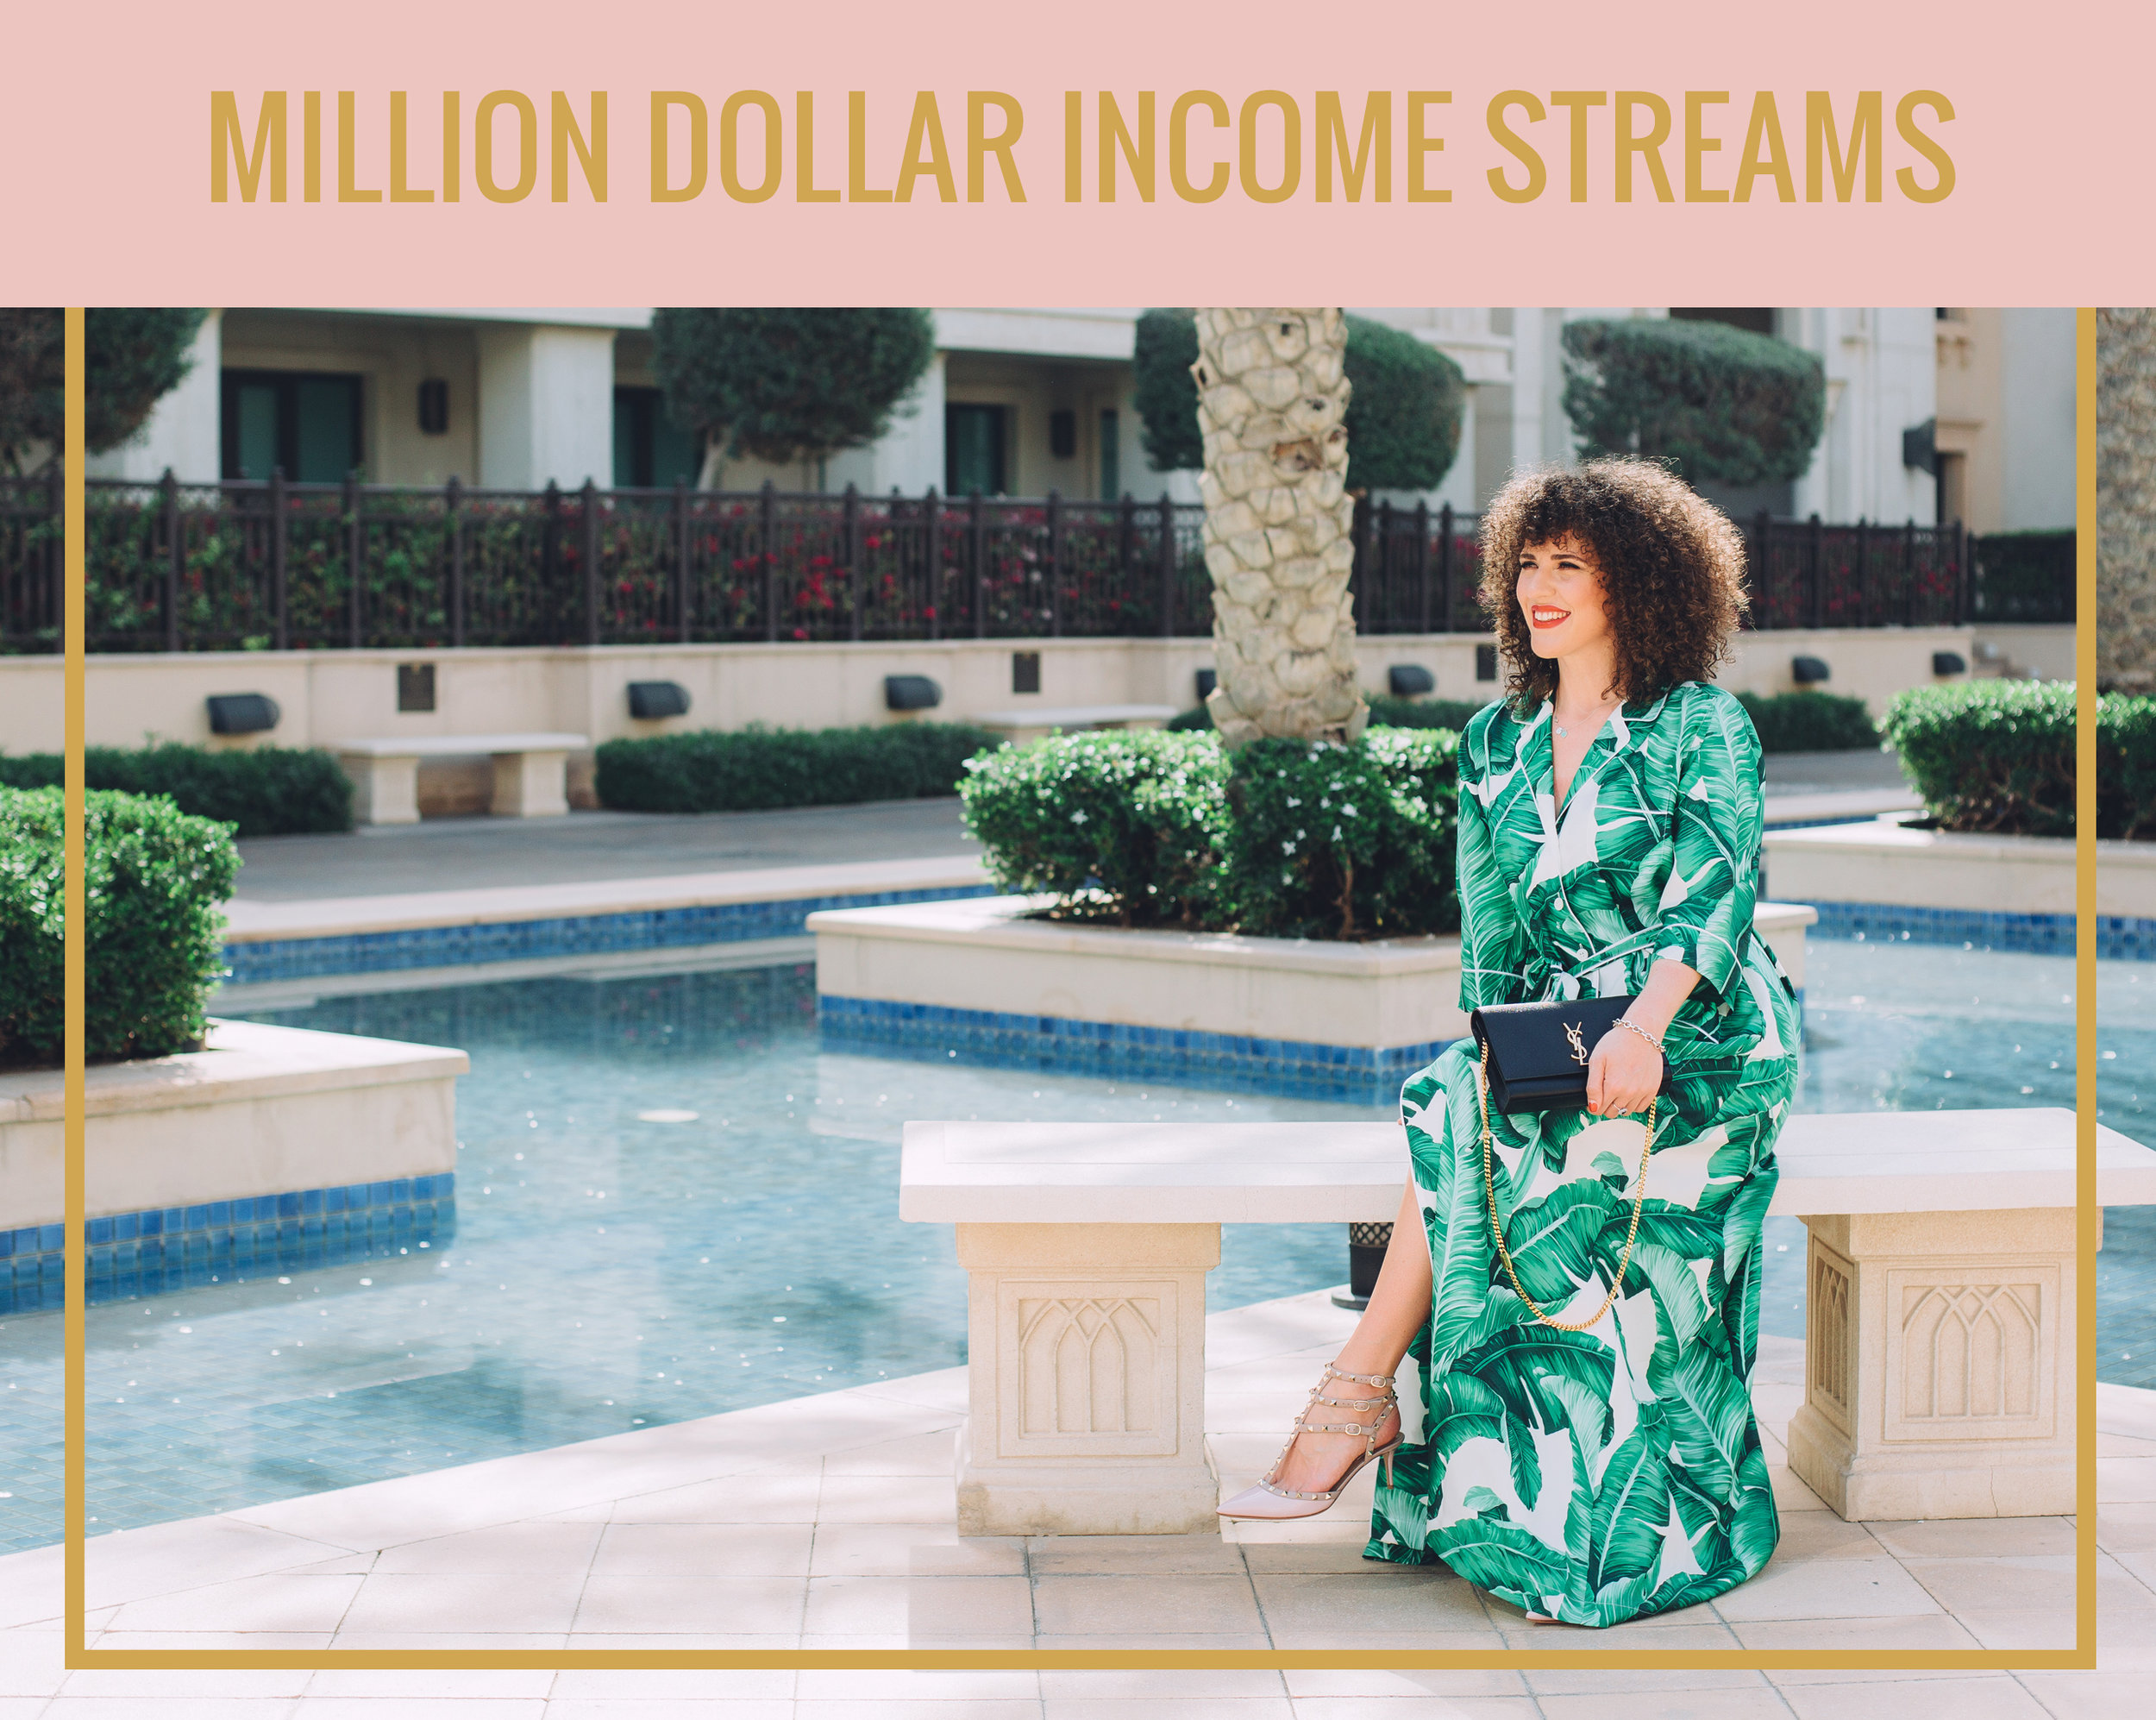 MILLION-DOLLAR-INCOME-STREAMS (4).jpg